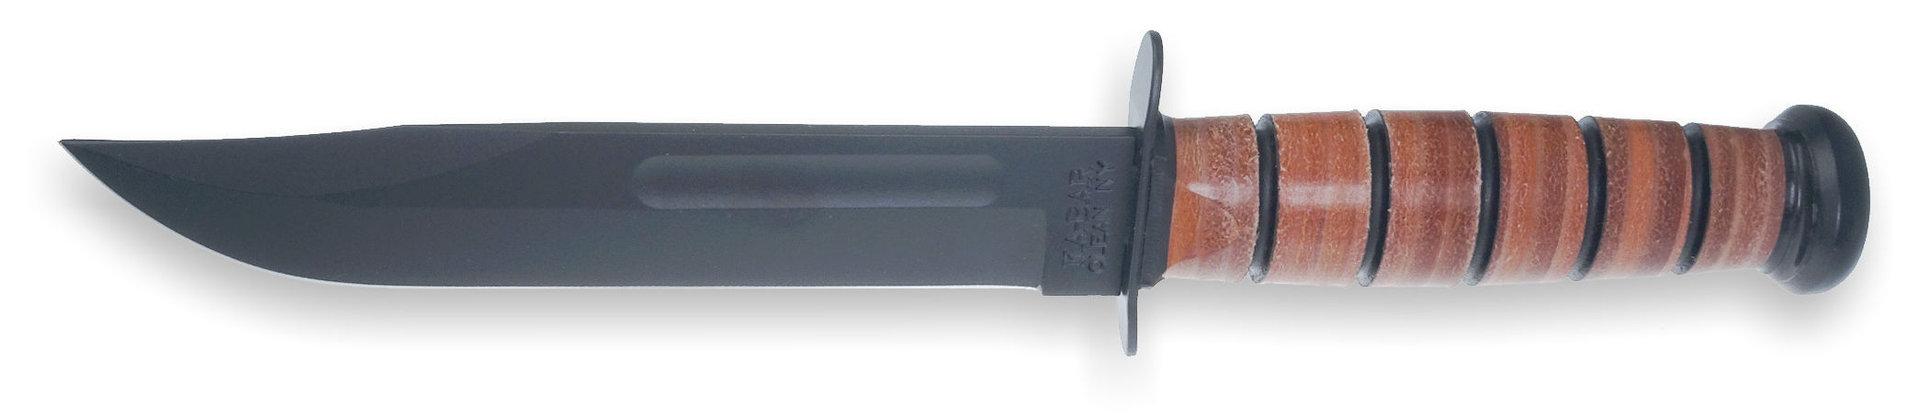 Kabar knife marine combat KA